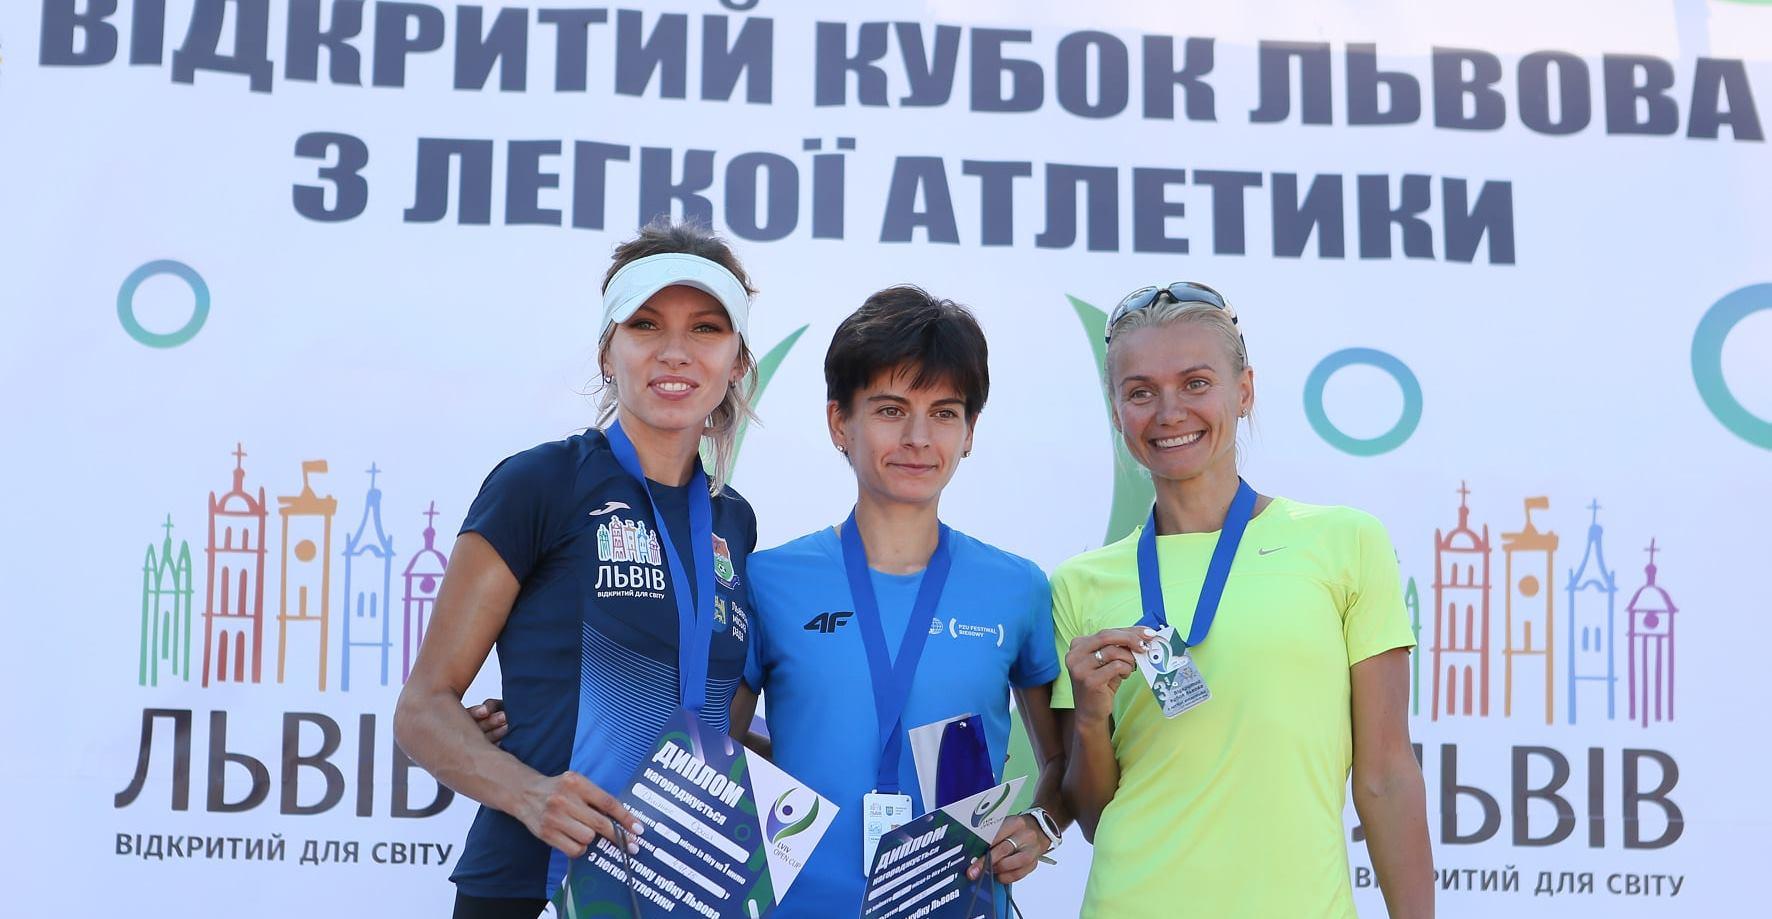 Харьковские легкоатлетки — на подиуме в Стамбуле и Львове